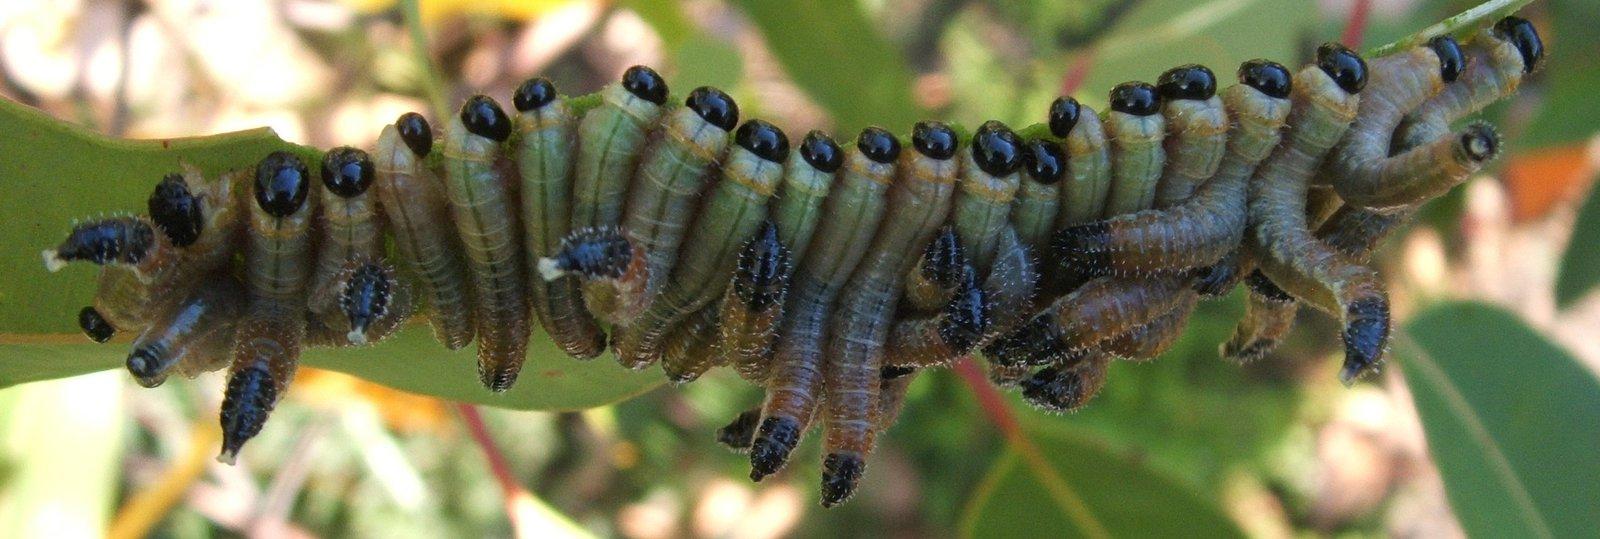 Gum Tree Sawfly larvae